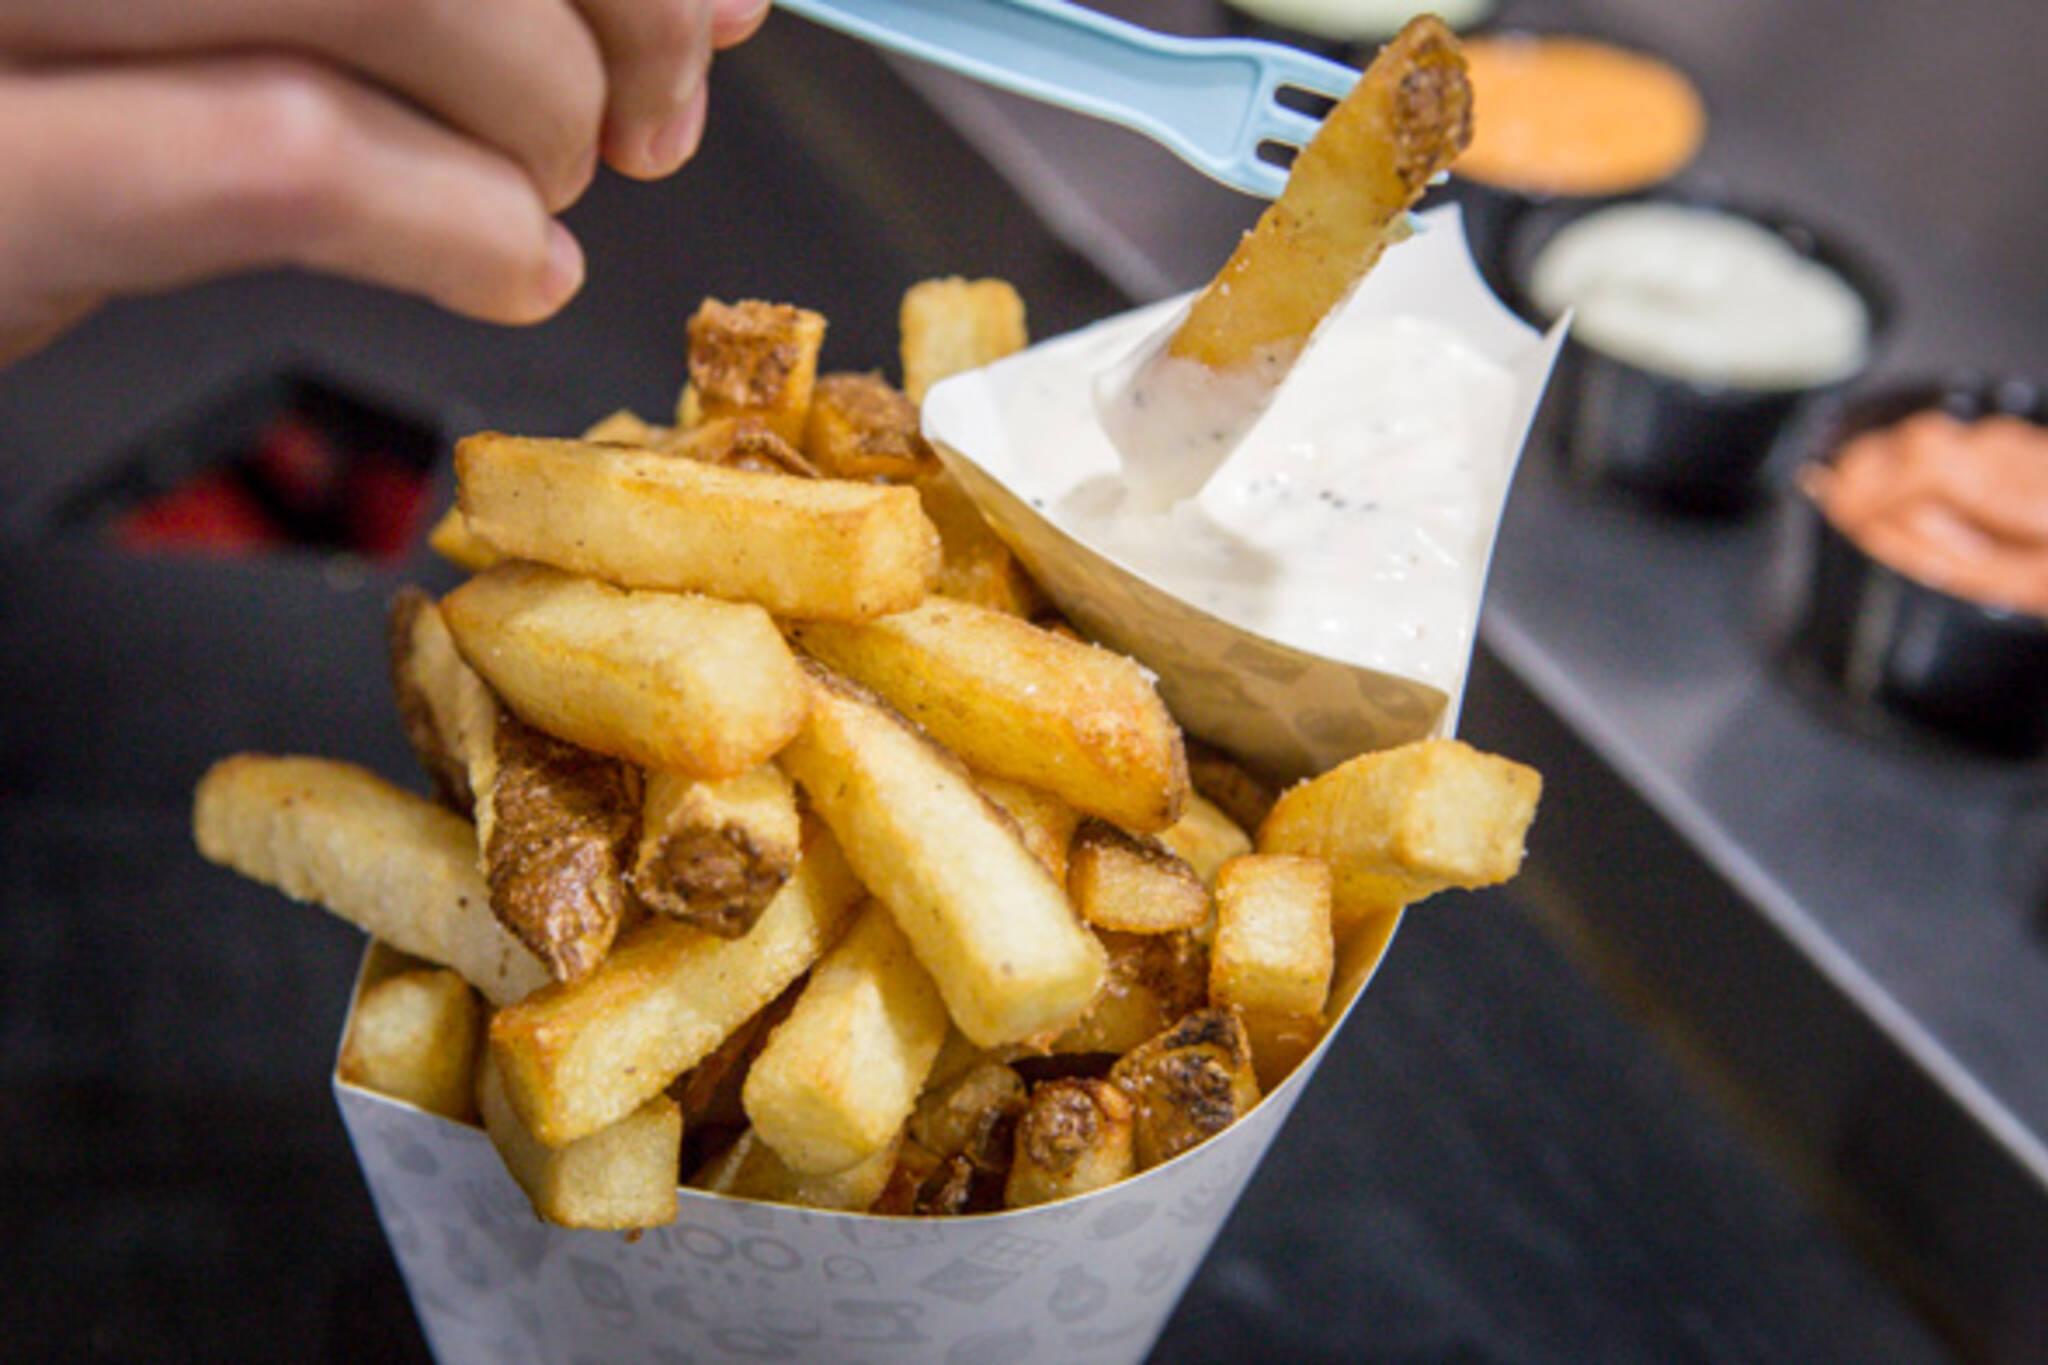 fries toronto